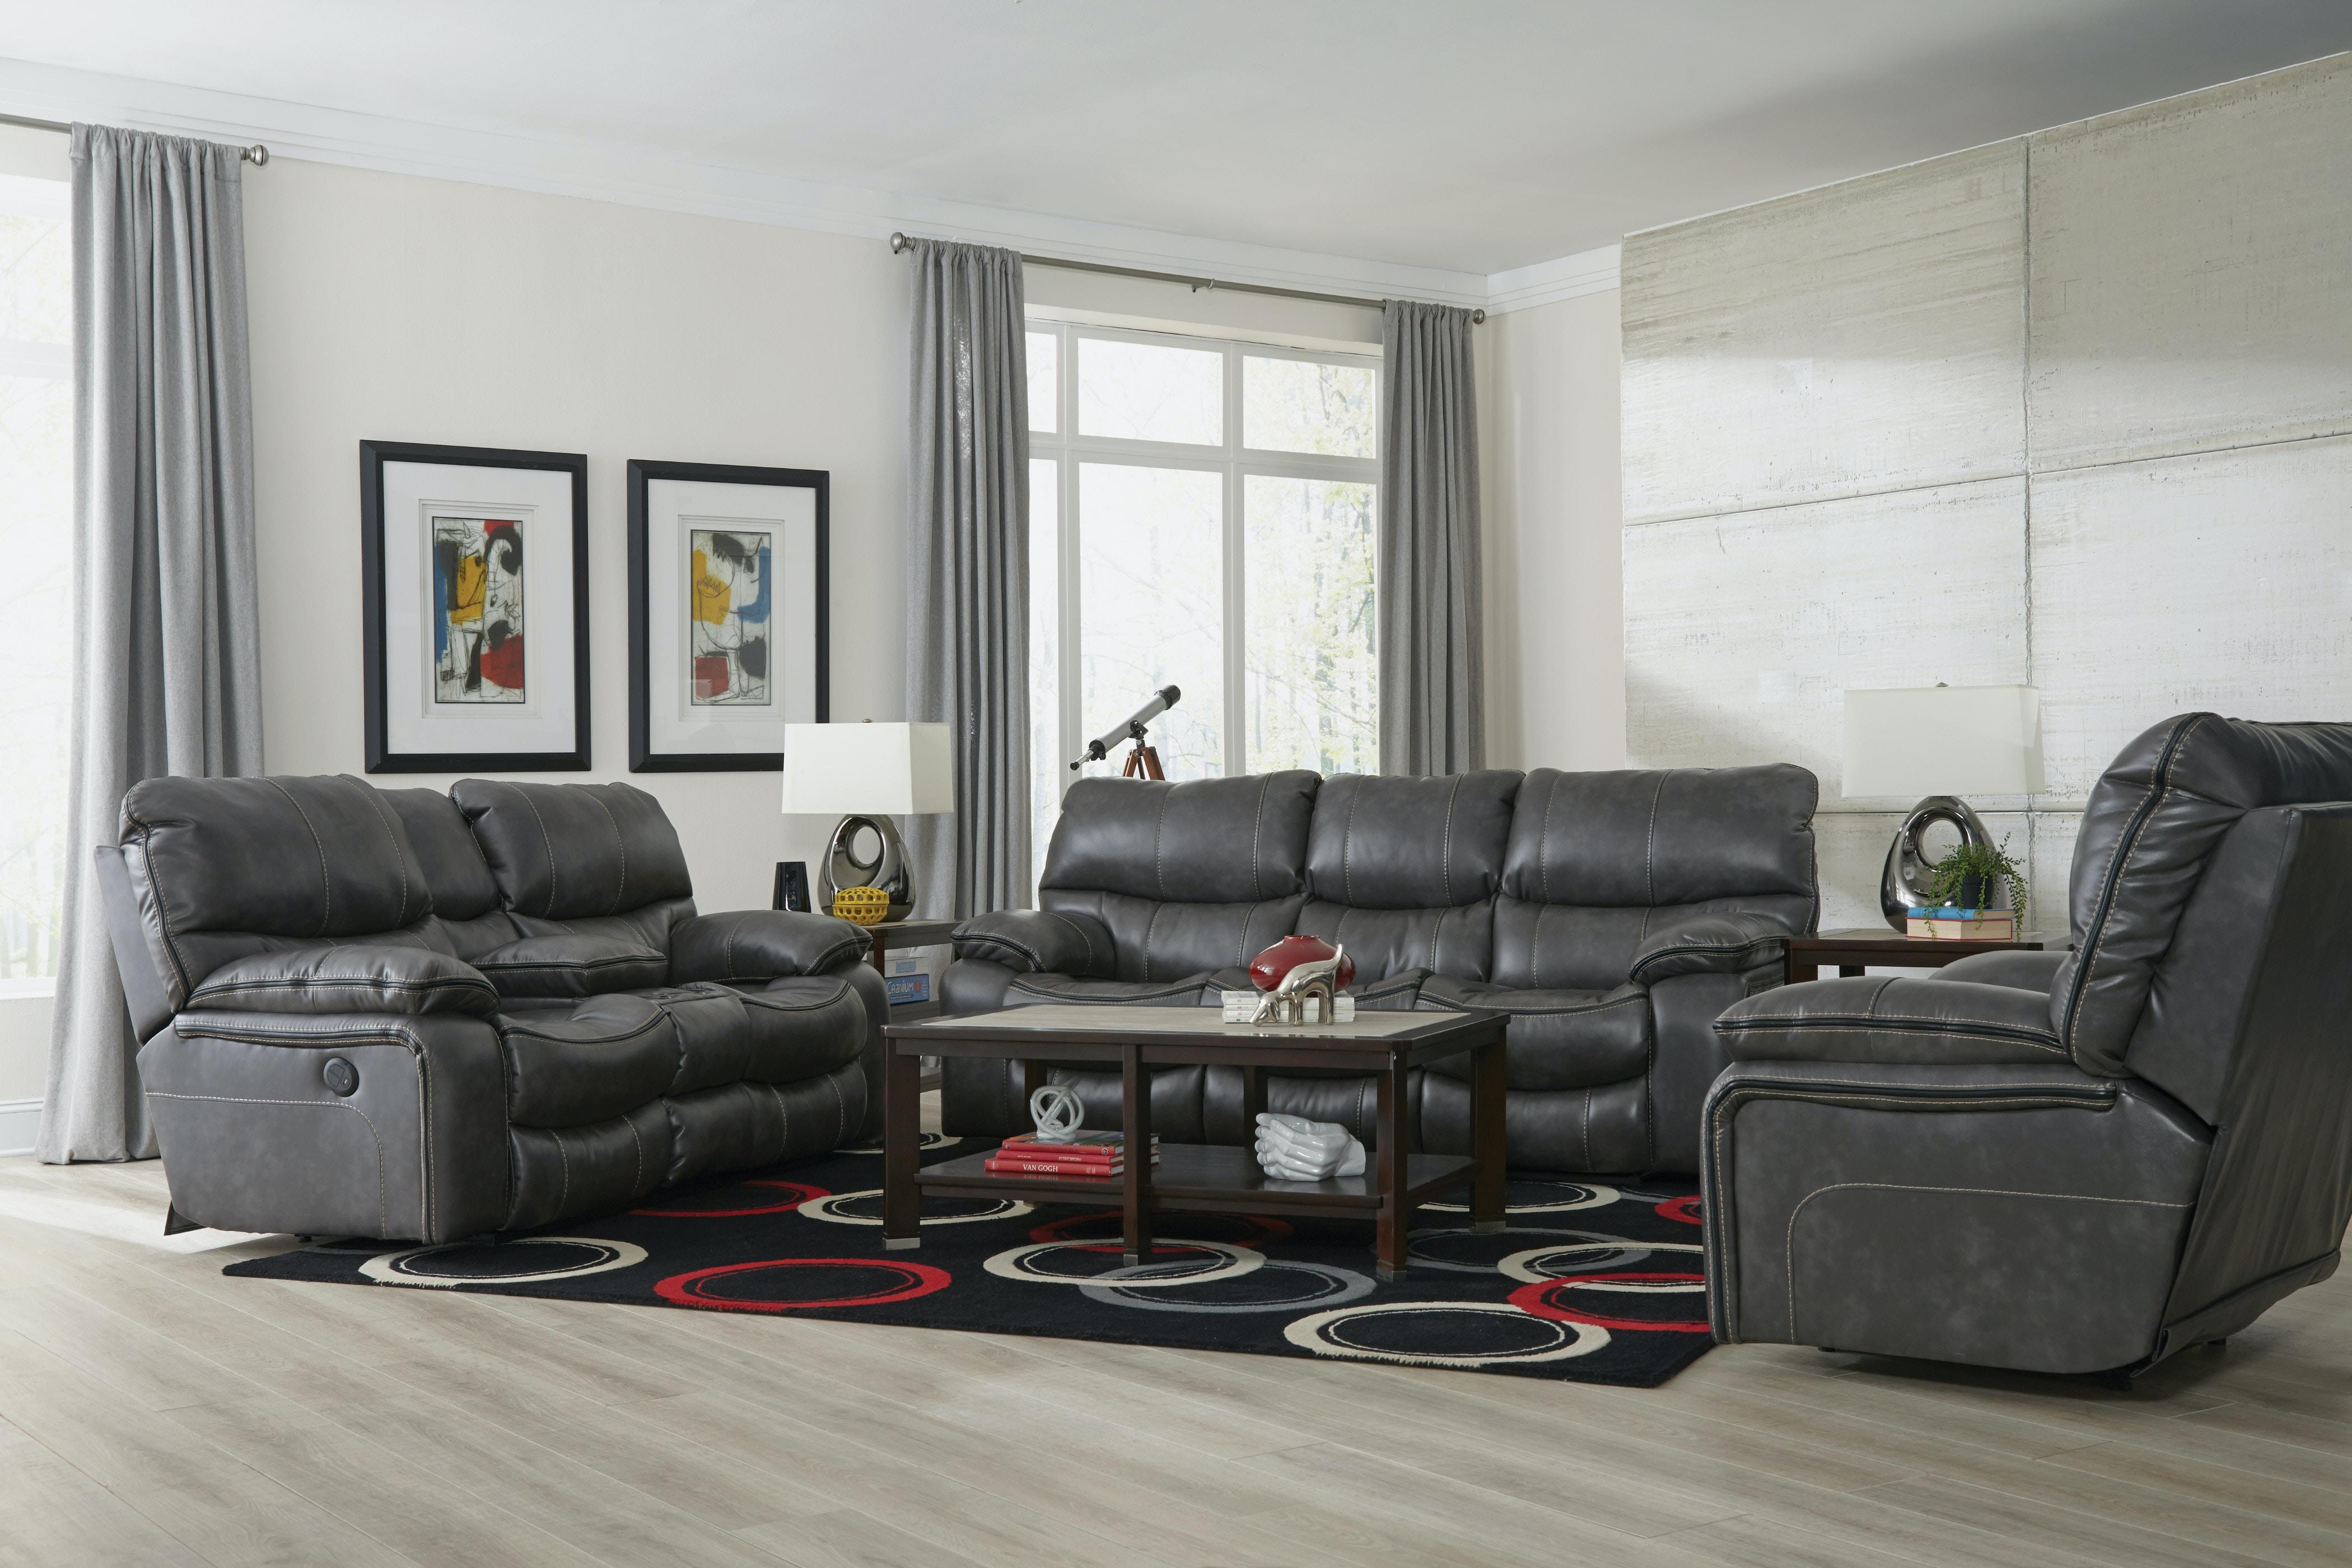 Living Room Sets Louisville Ky living room furniture sets louisville ky - popular living room 2017